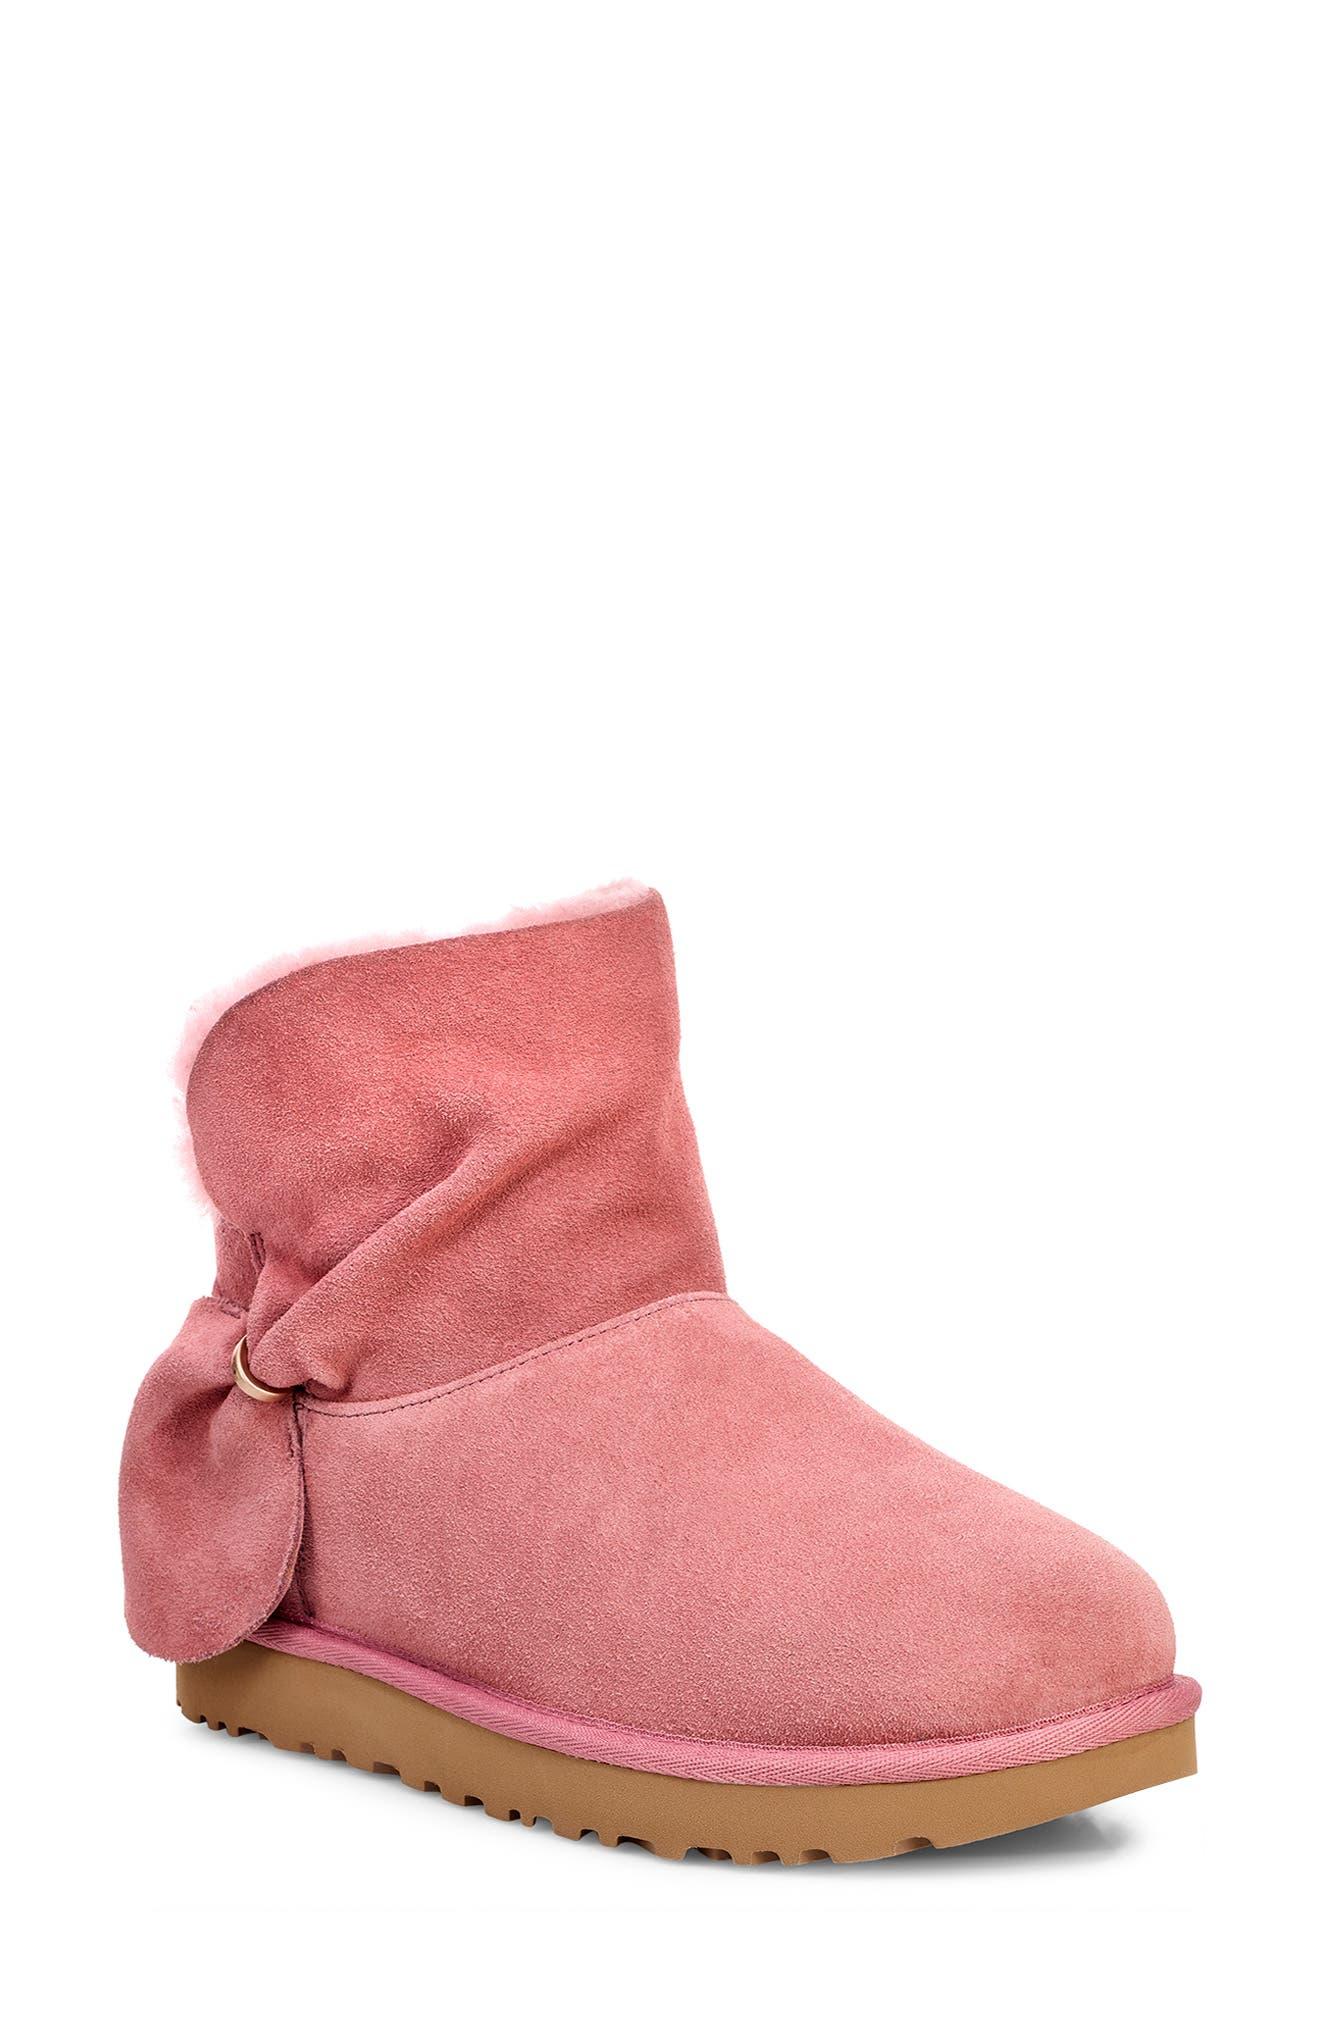 Ugg Classic Mini Twist Bootie, Pink